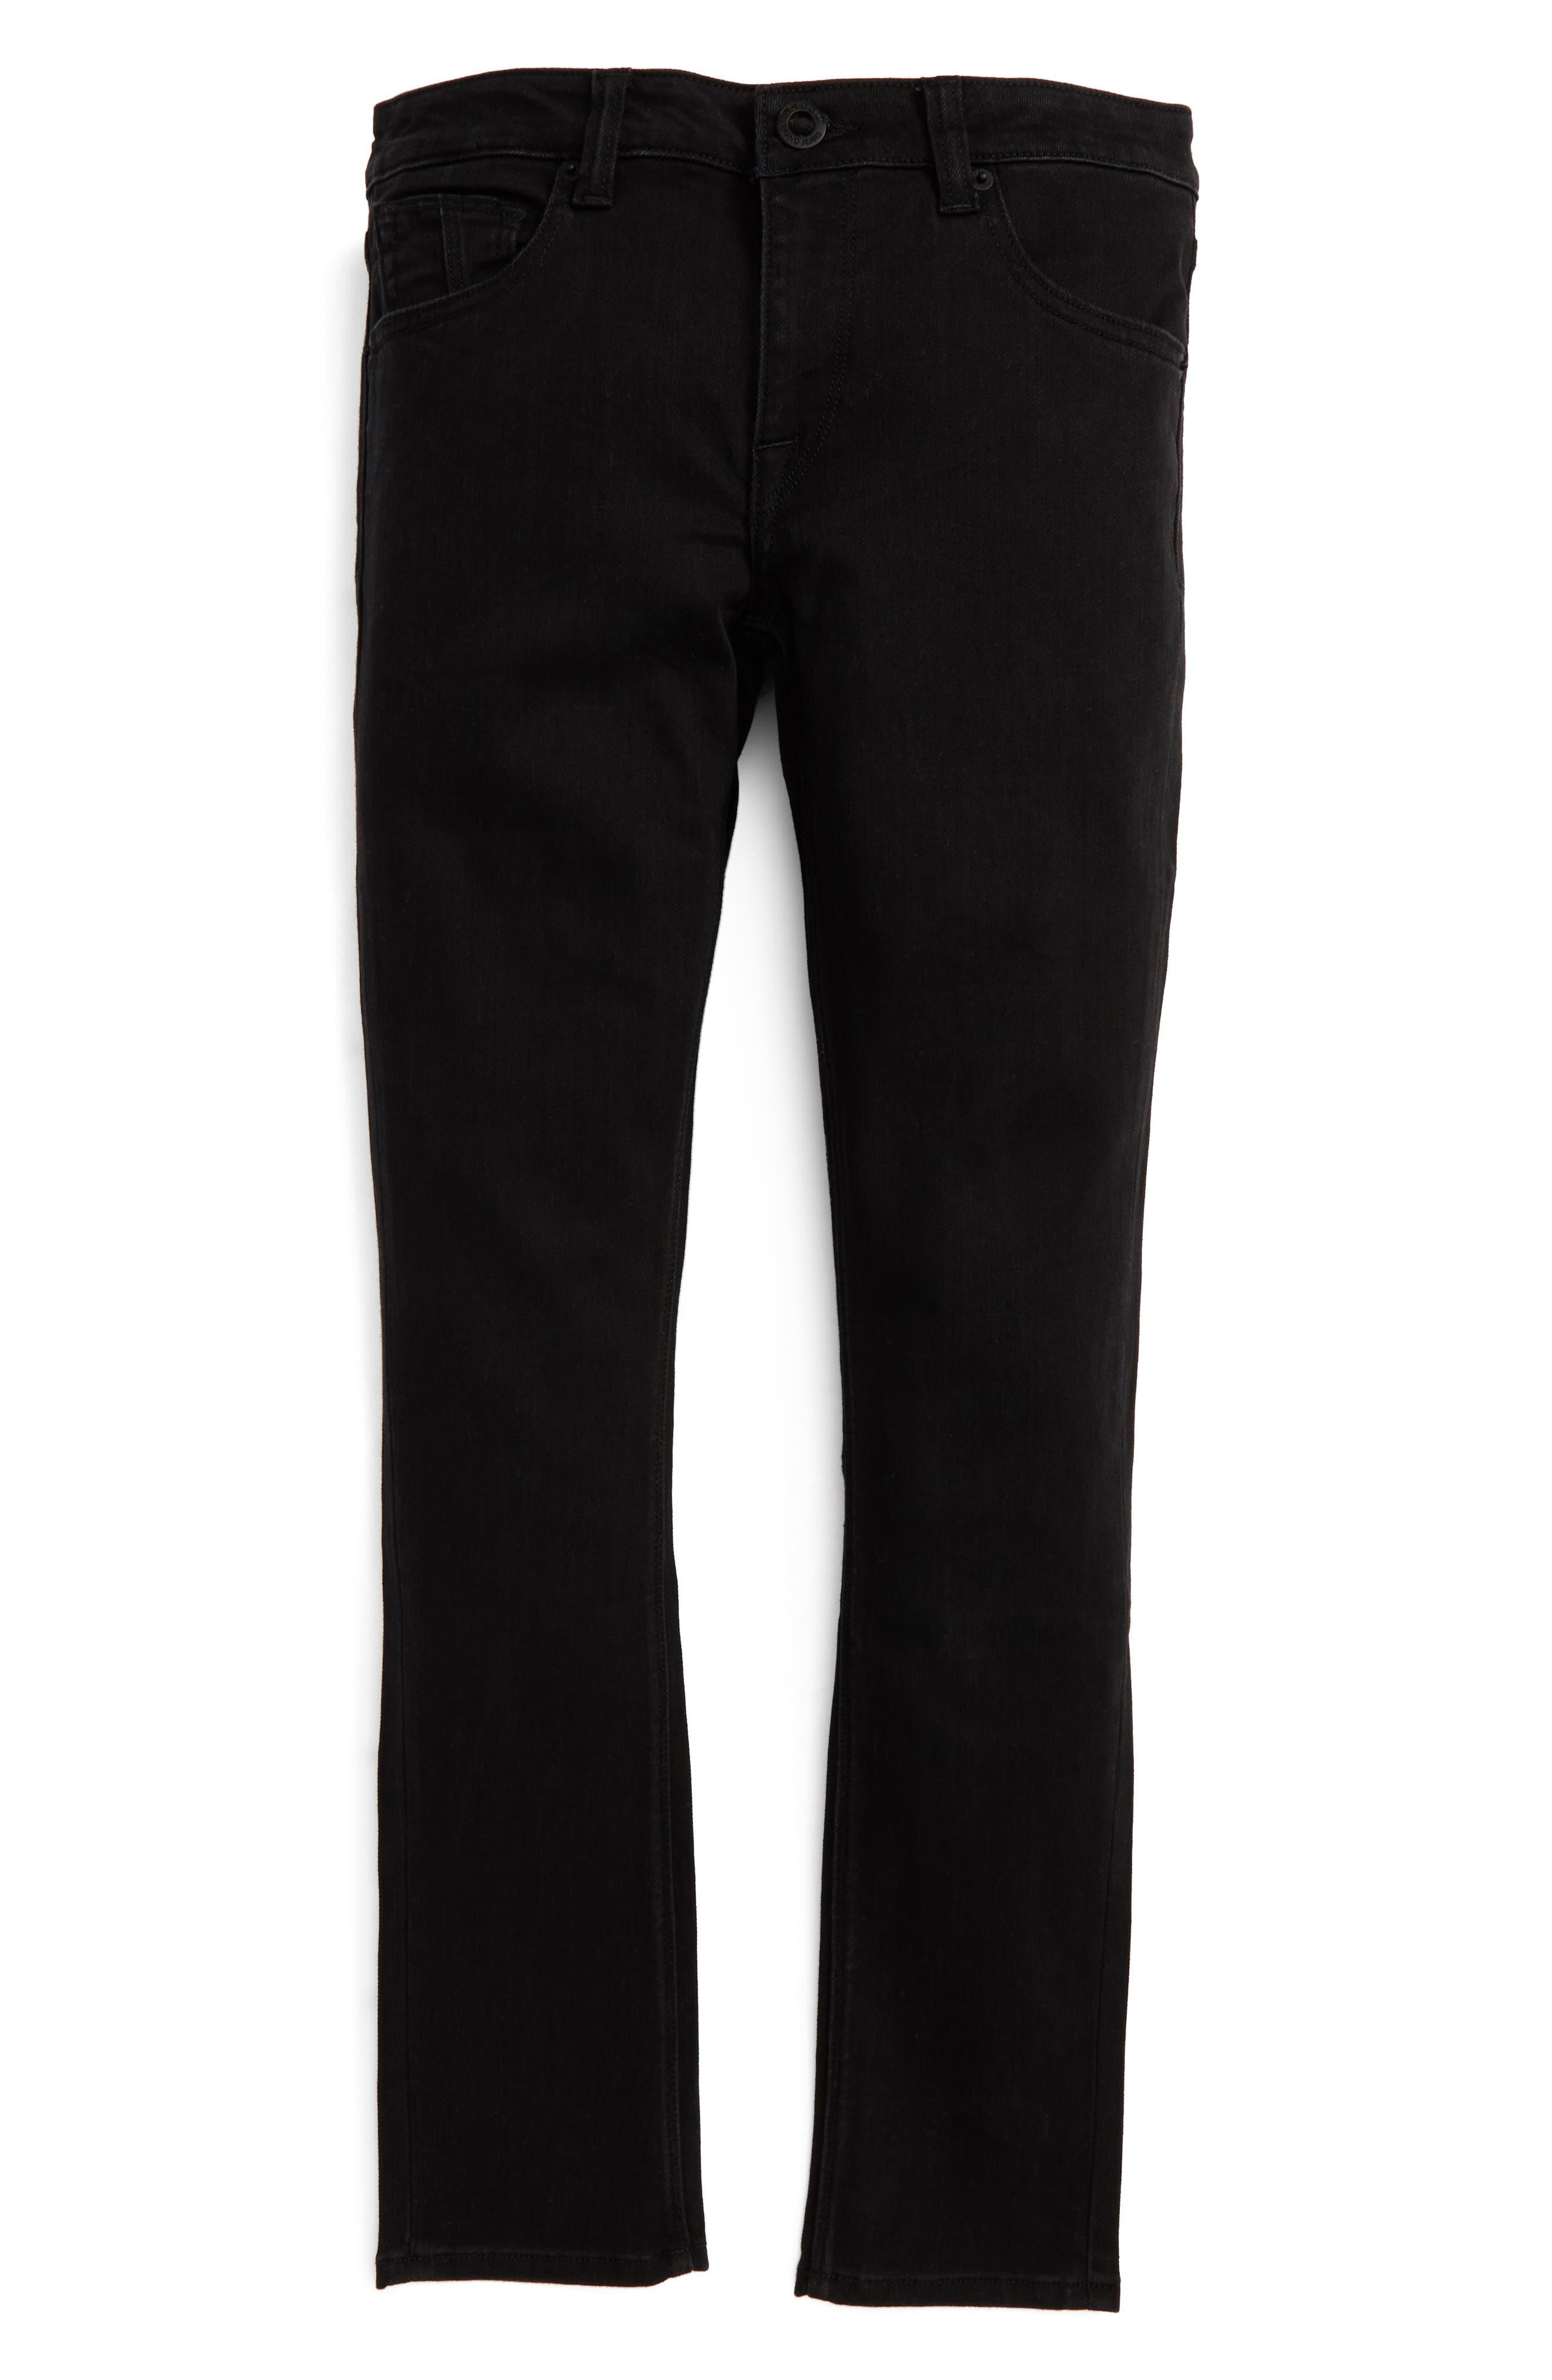 'Solver' Straight Leg Denim Jeans,                             Main thumbnail 1, color,                             New Black